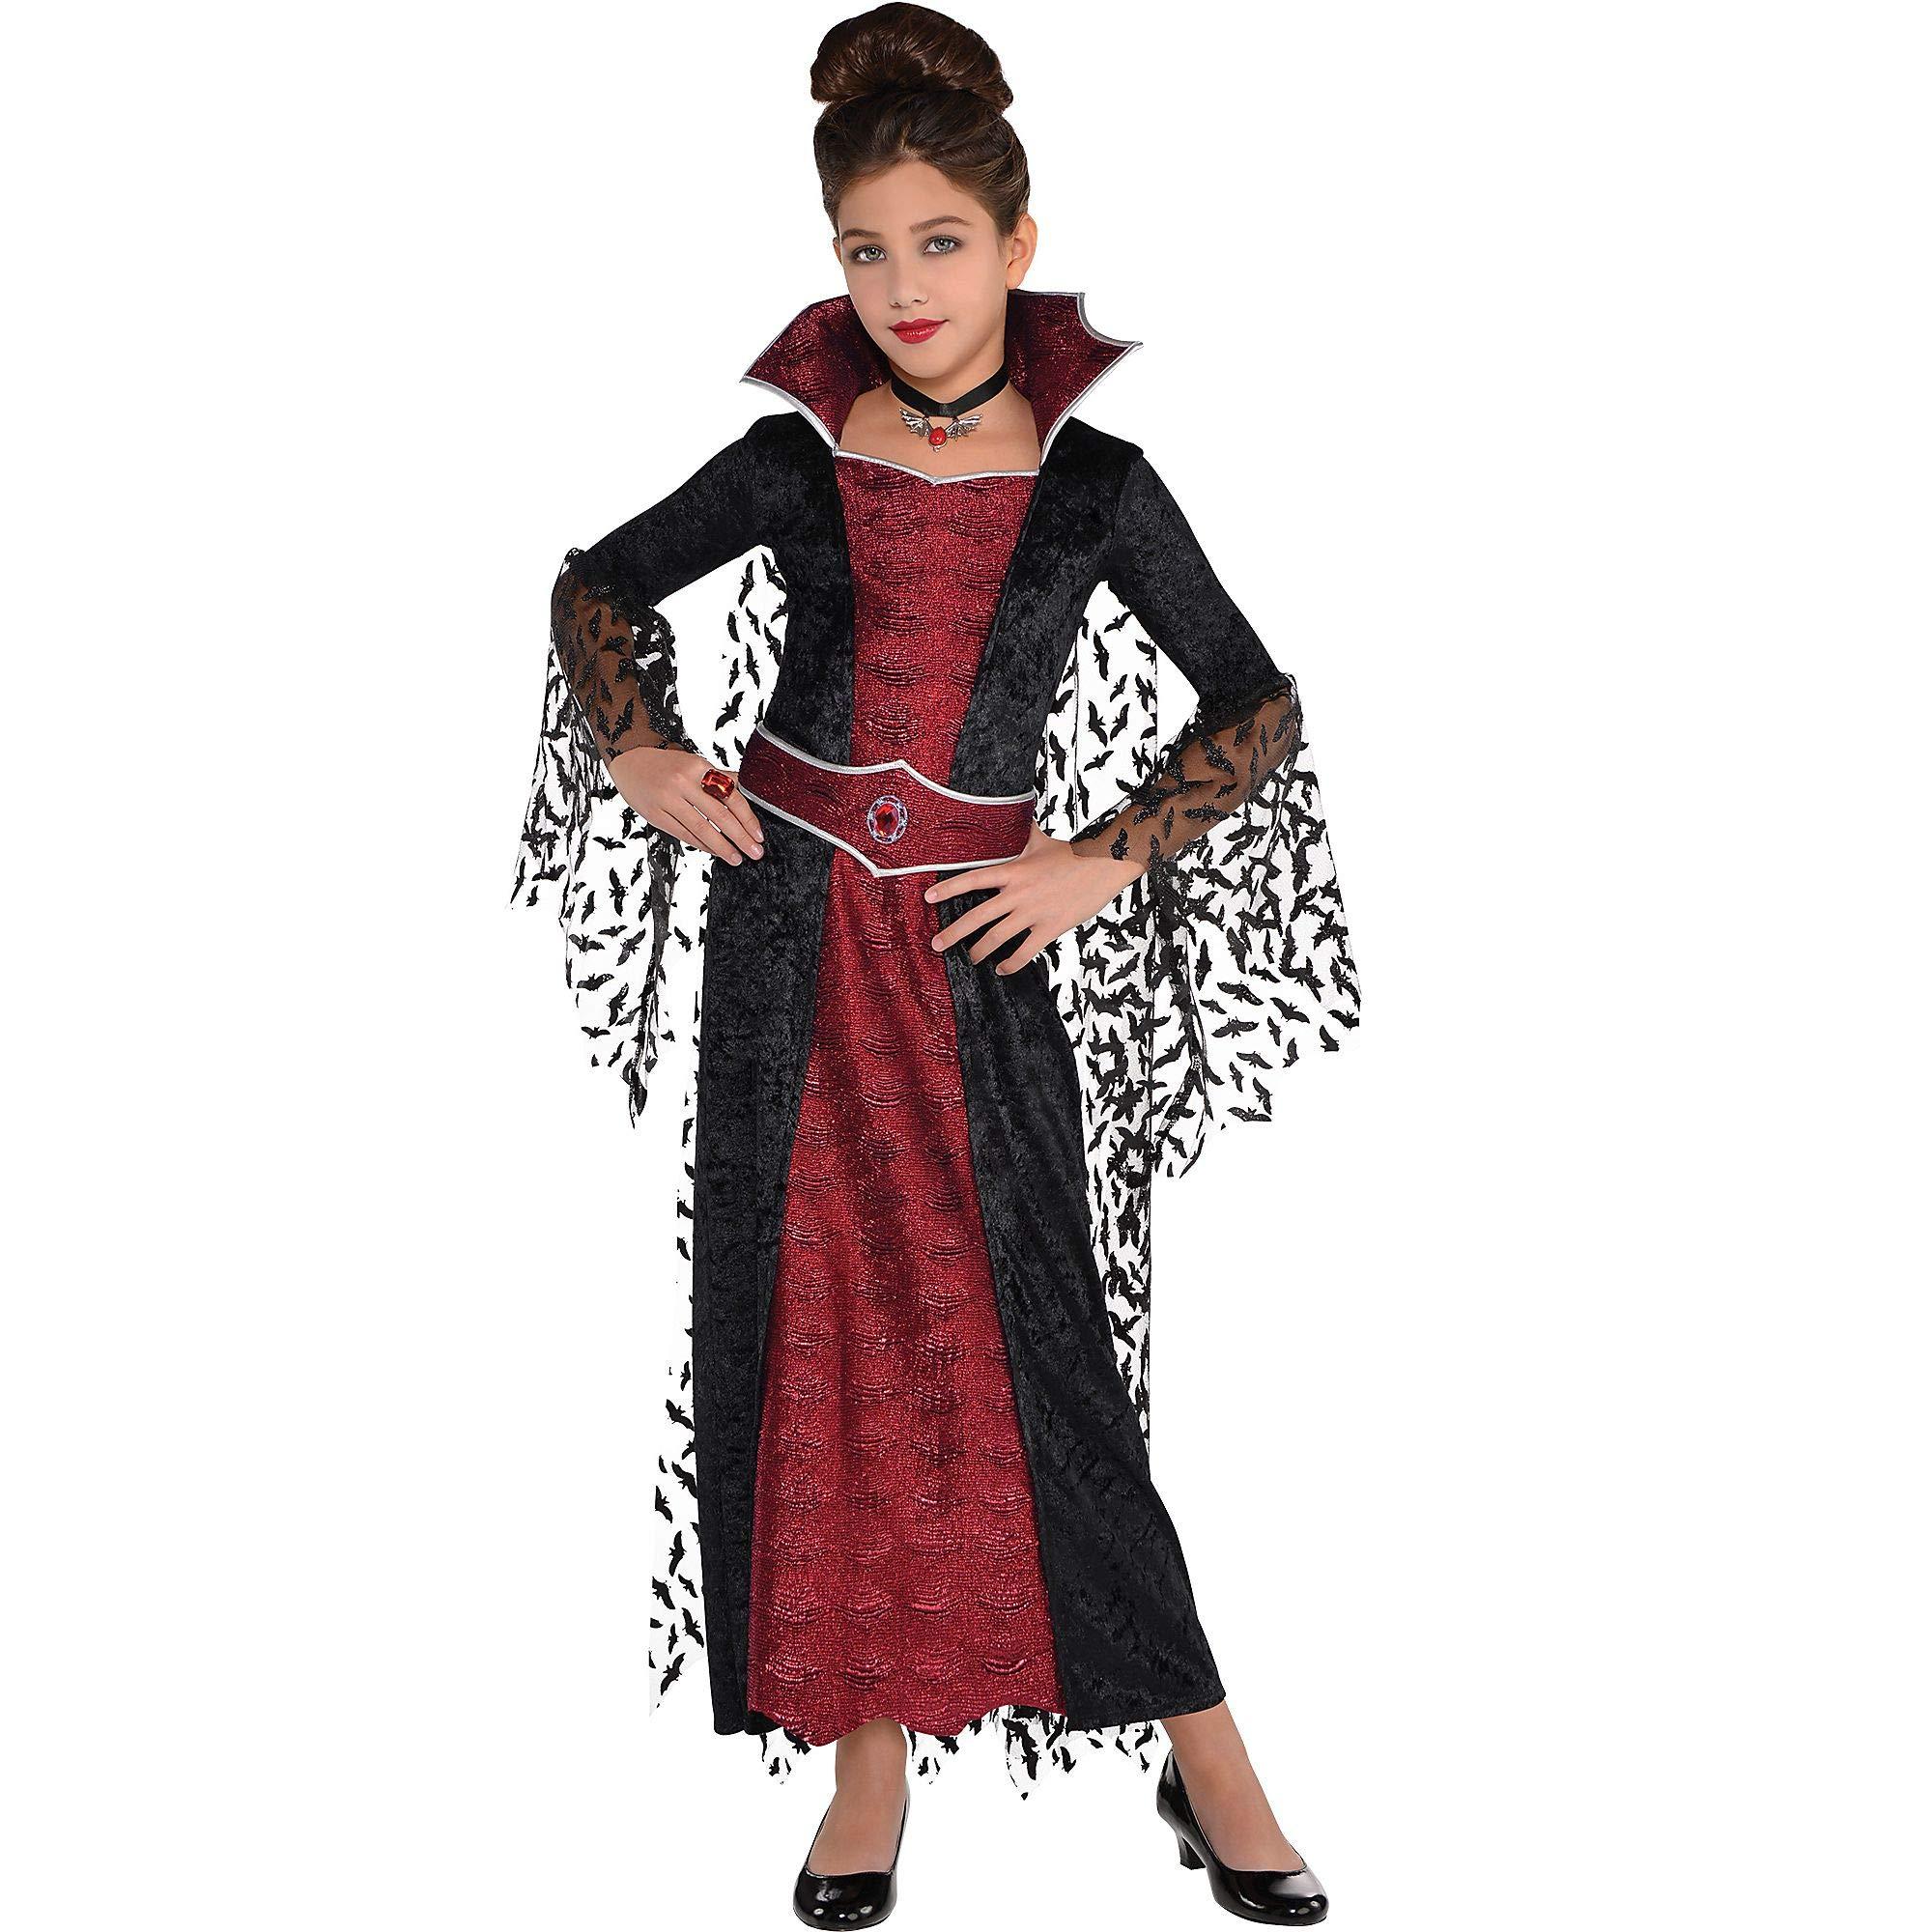 Girls Coffin Queen Vampire Costume - Medium (8-10) by amscan